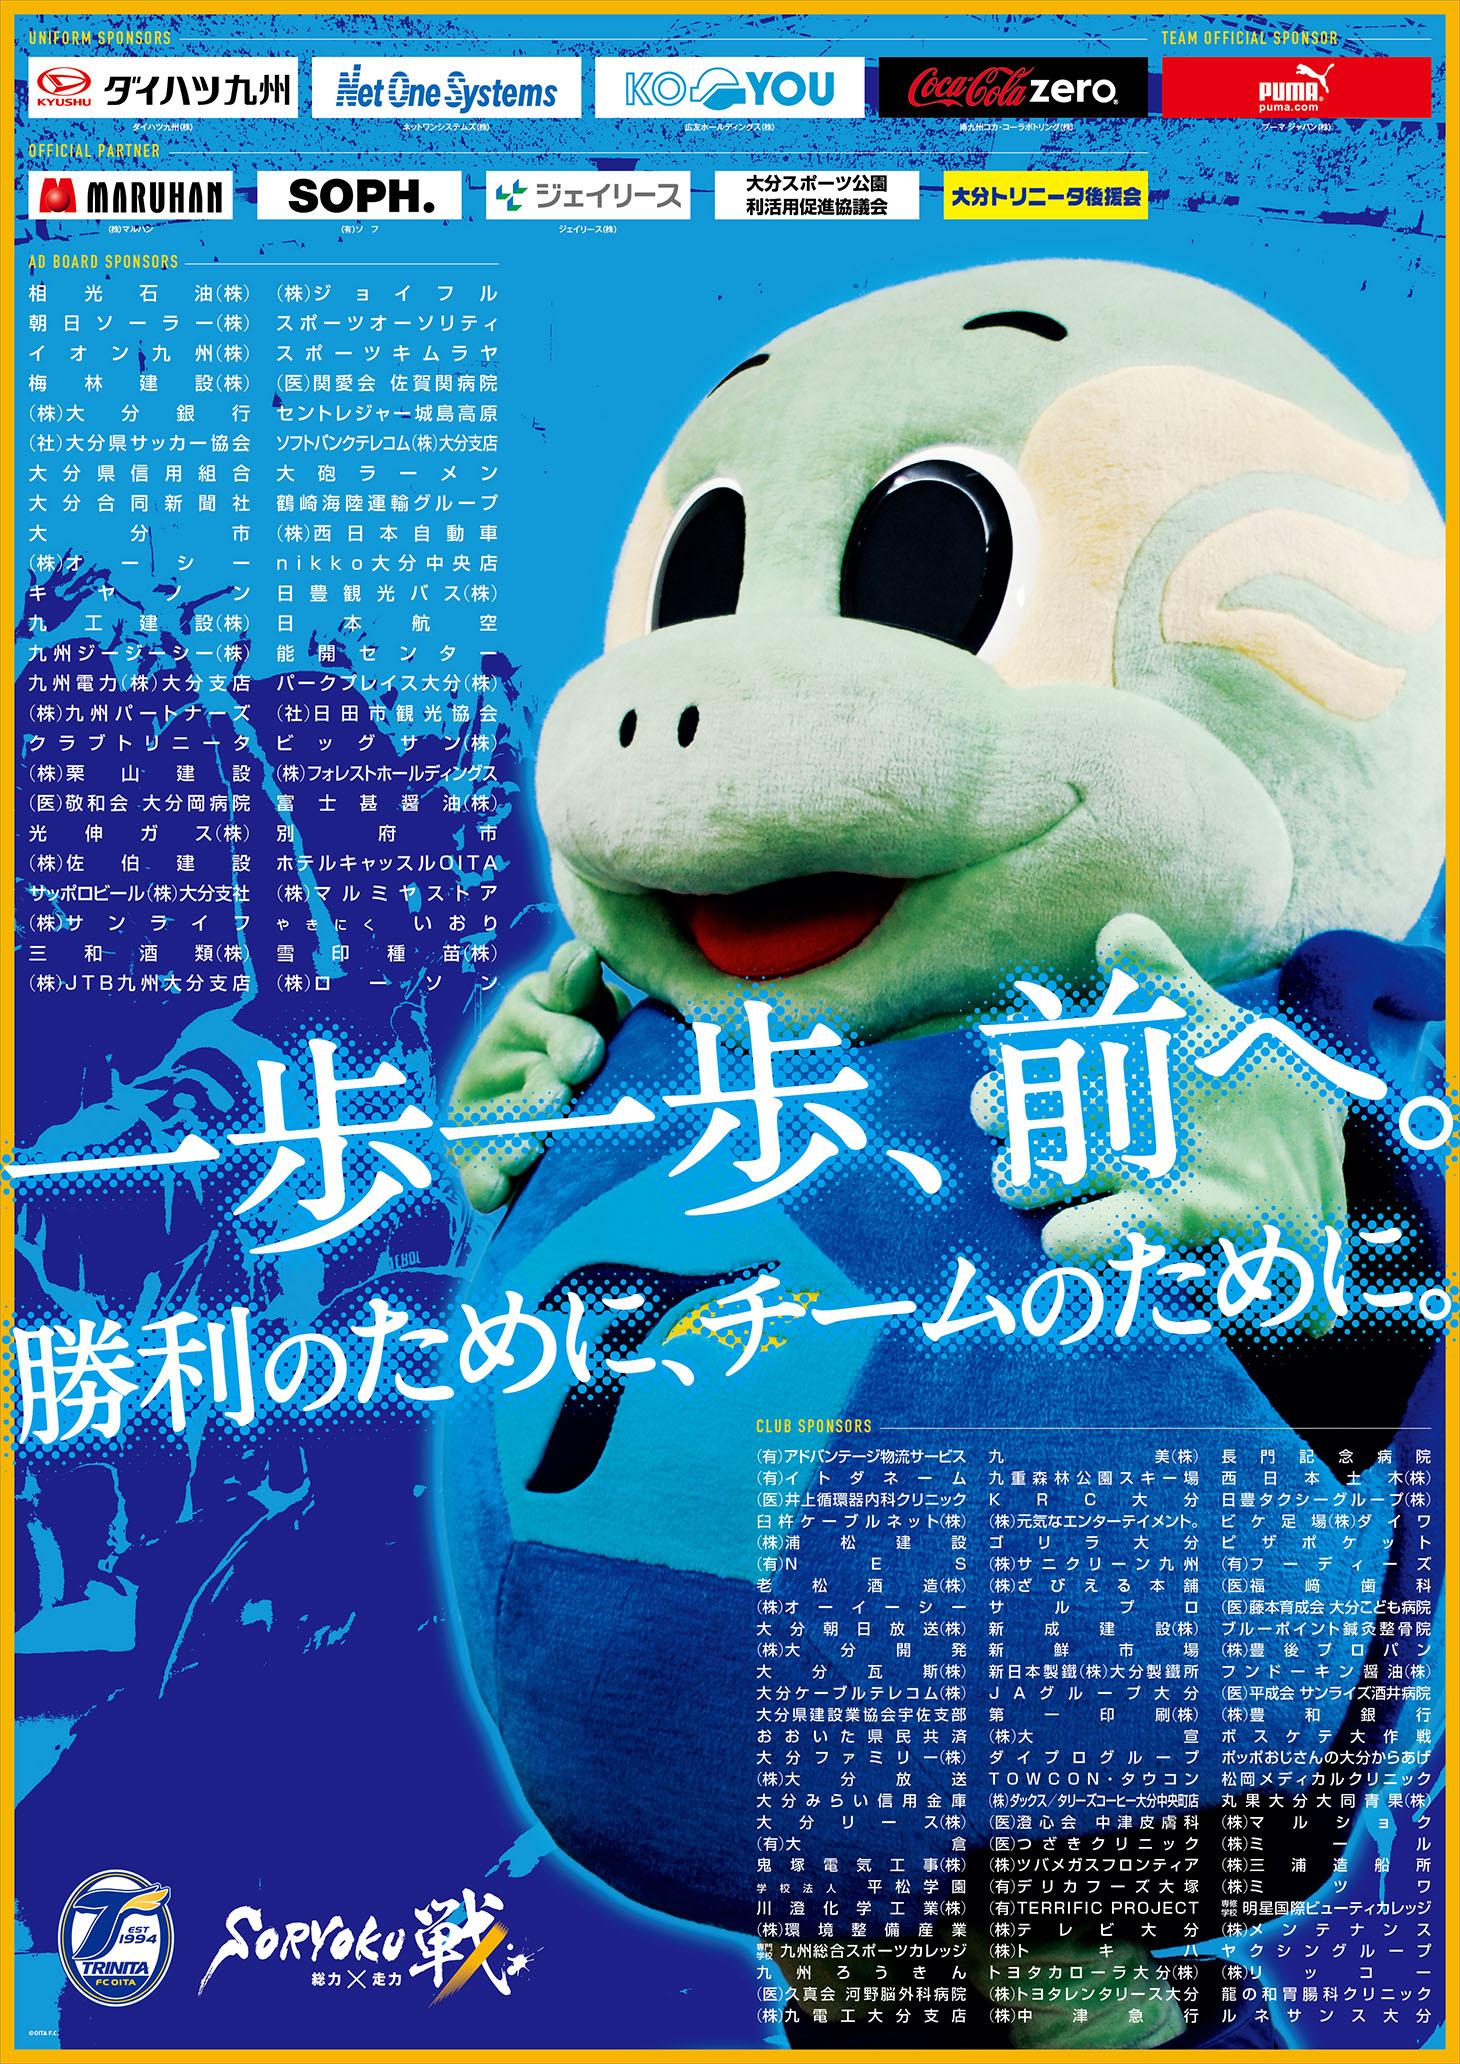 OITA TRINITA 2011後期協賛企業ポスター